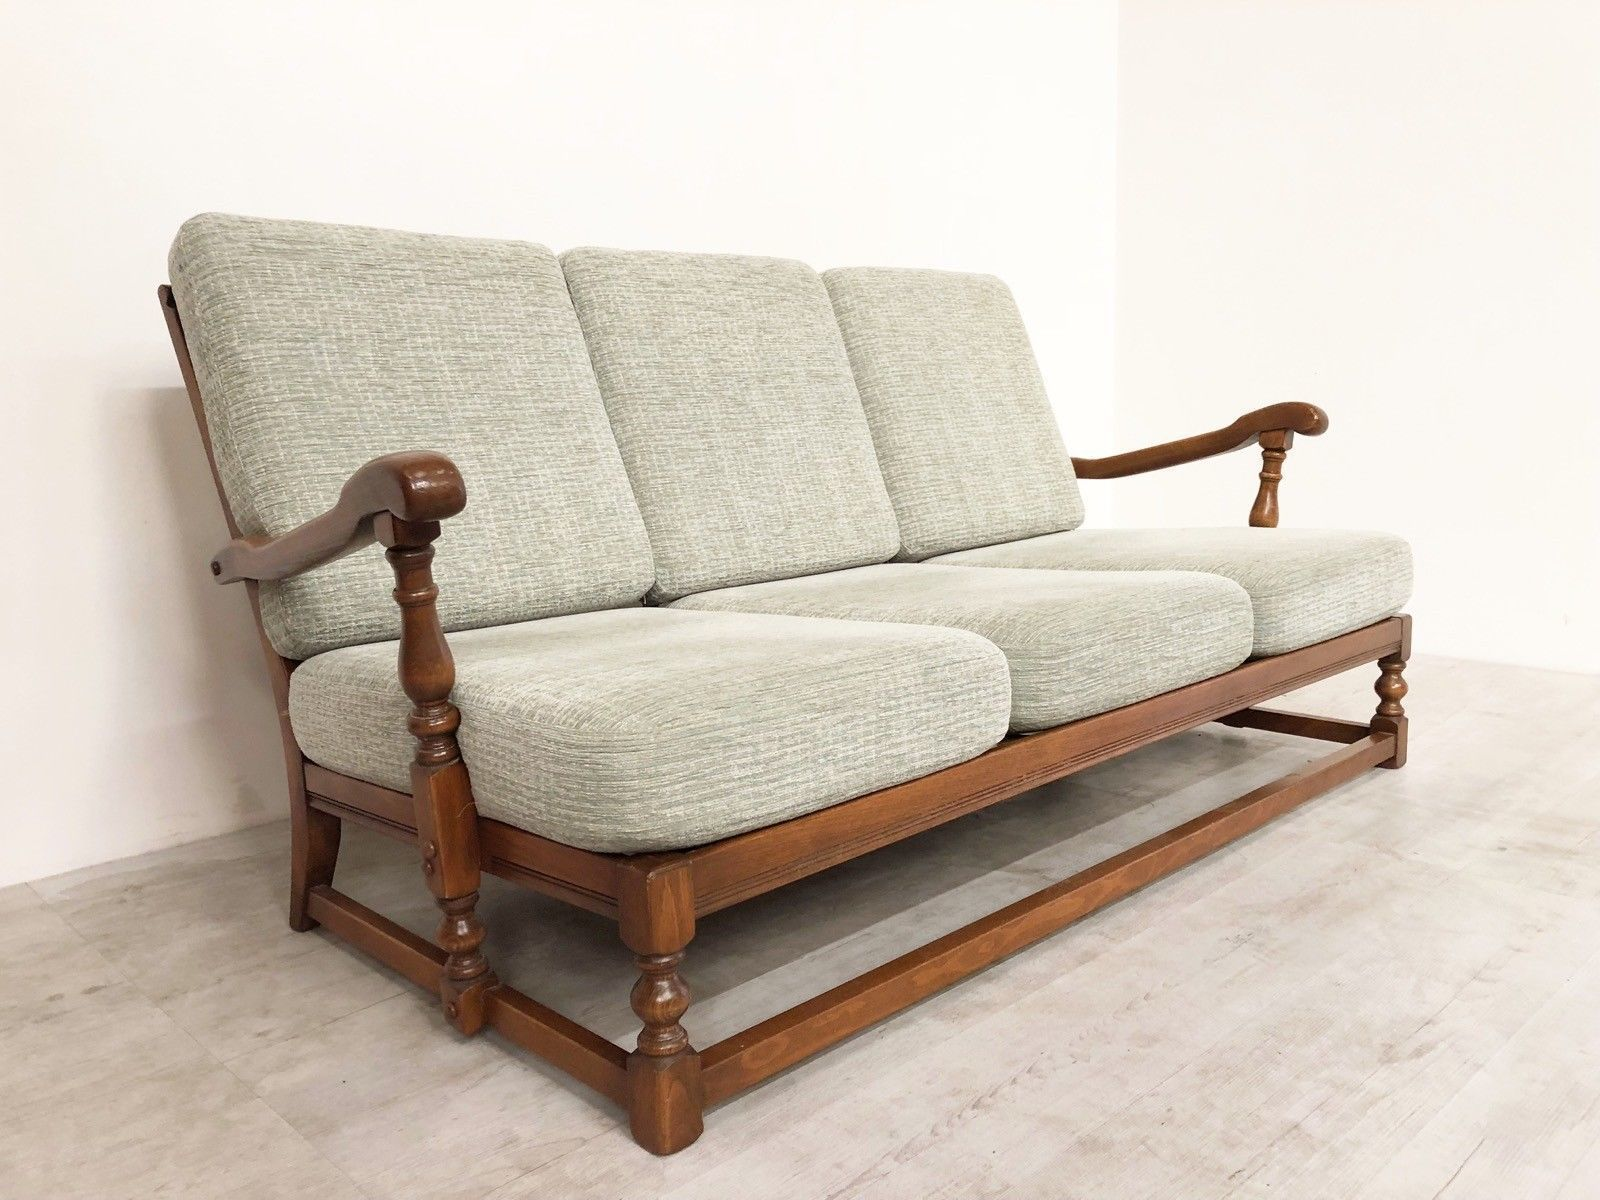 Marvelous Vintage Colonial Four Piece Suite Sofa Chairs Ibusinesslaw Wood Chair Design Ideas Ibusinesslaworg